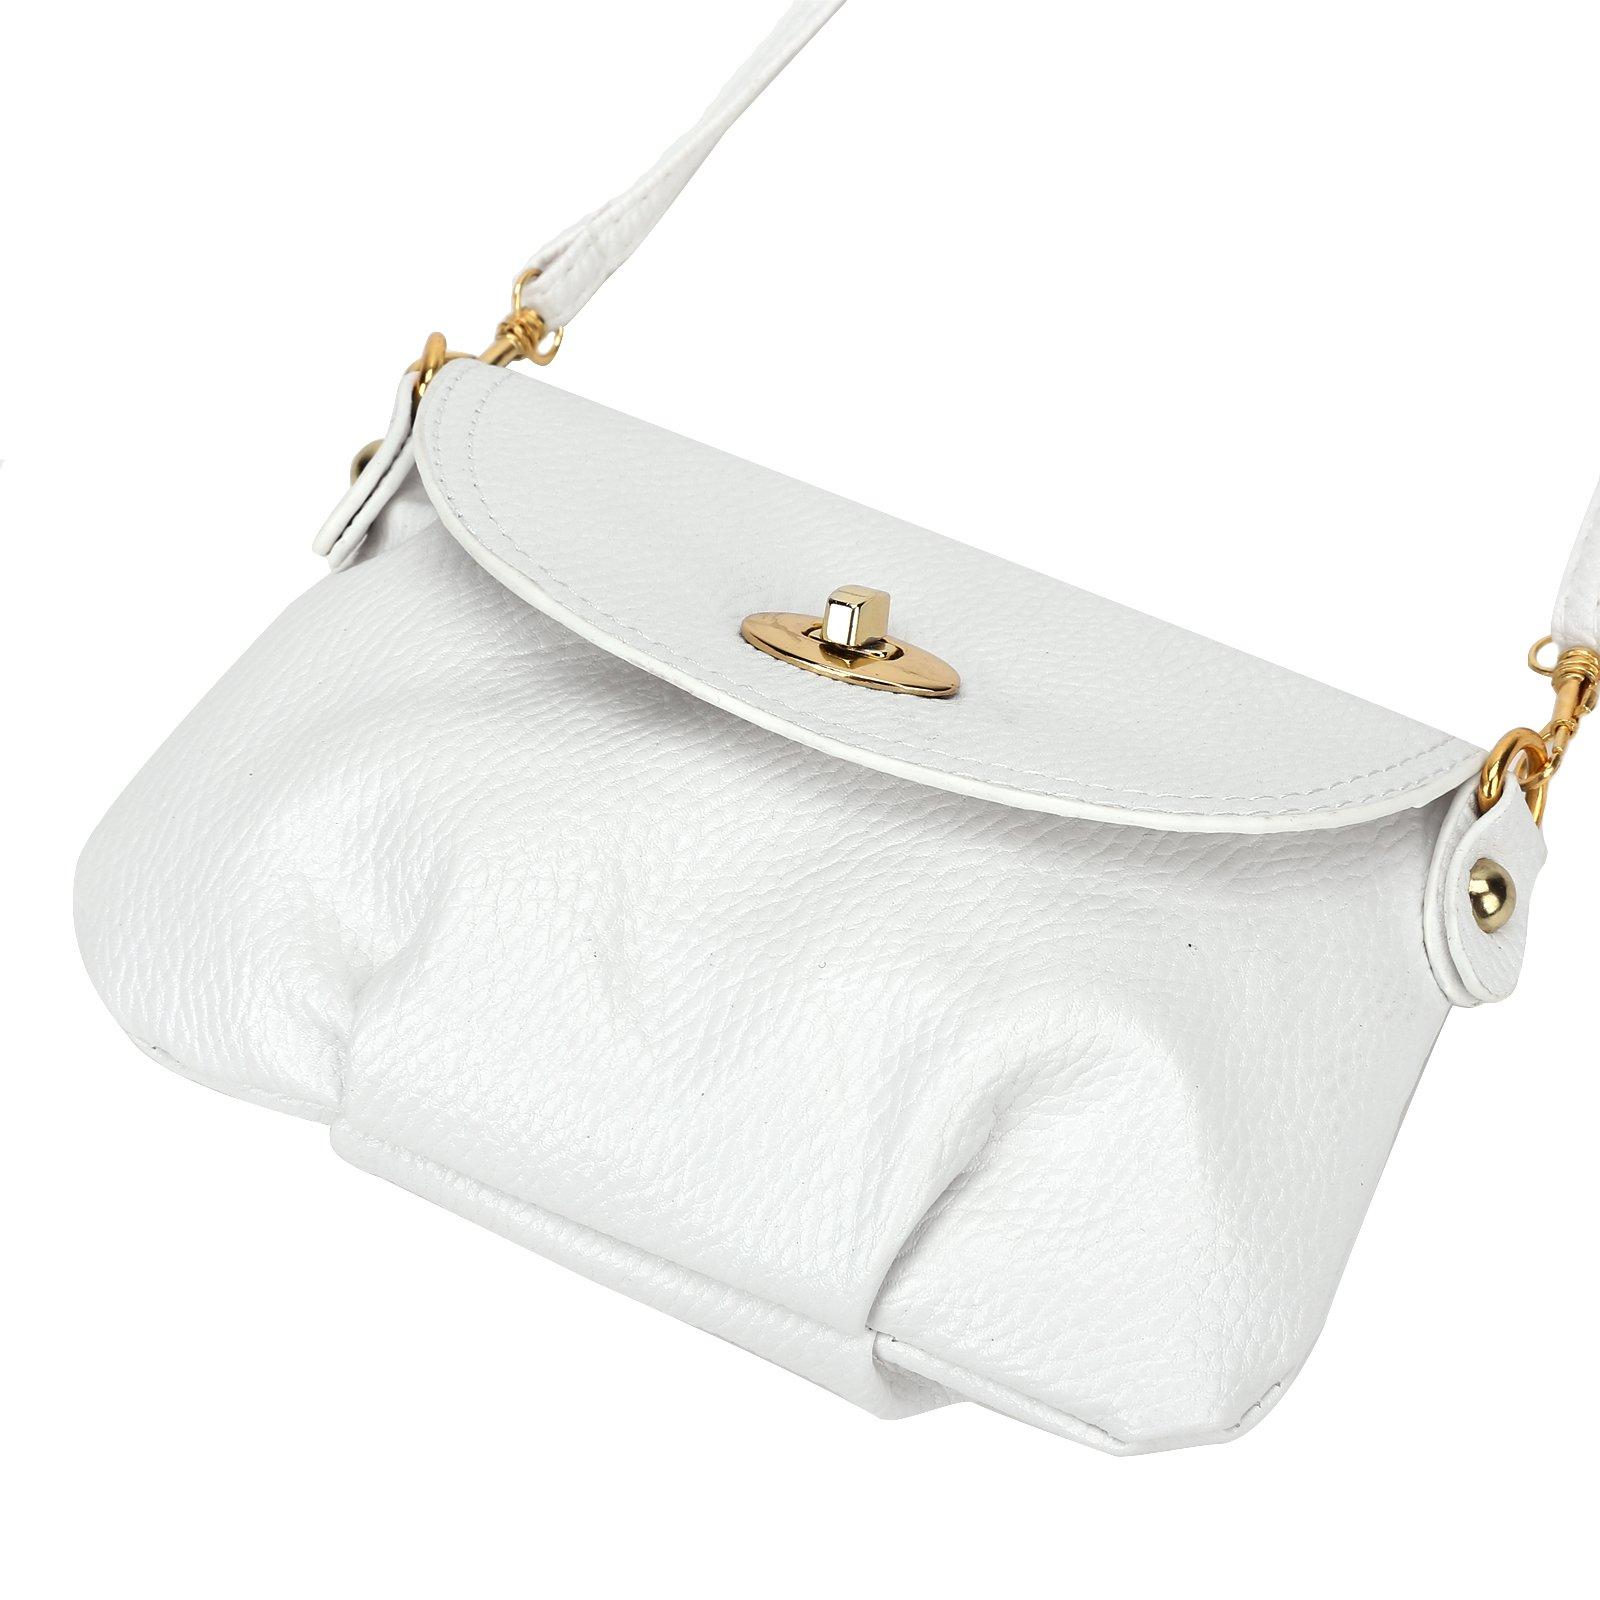 Ladies Mini SMALL Handbag Envelope Crossbody Shoulder Messenger Totes Bag Purse by Anladia (Image #5)